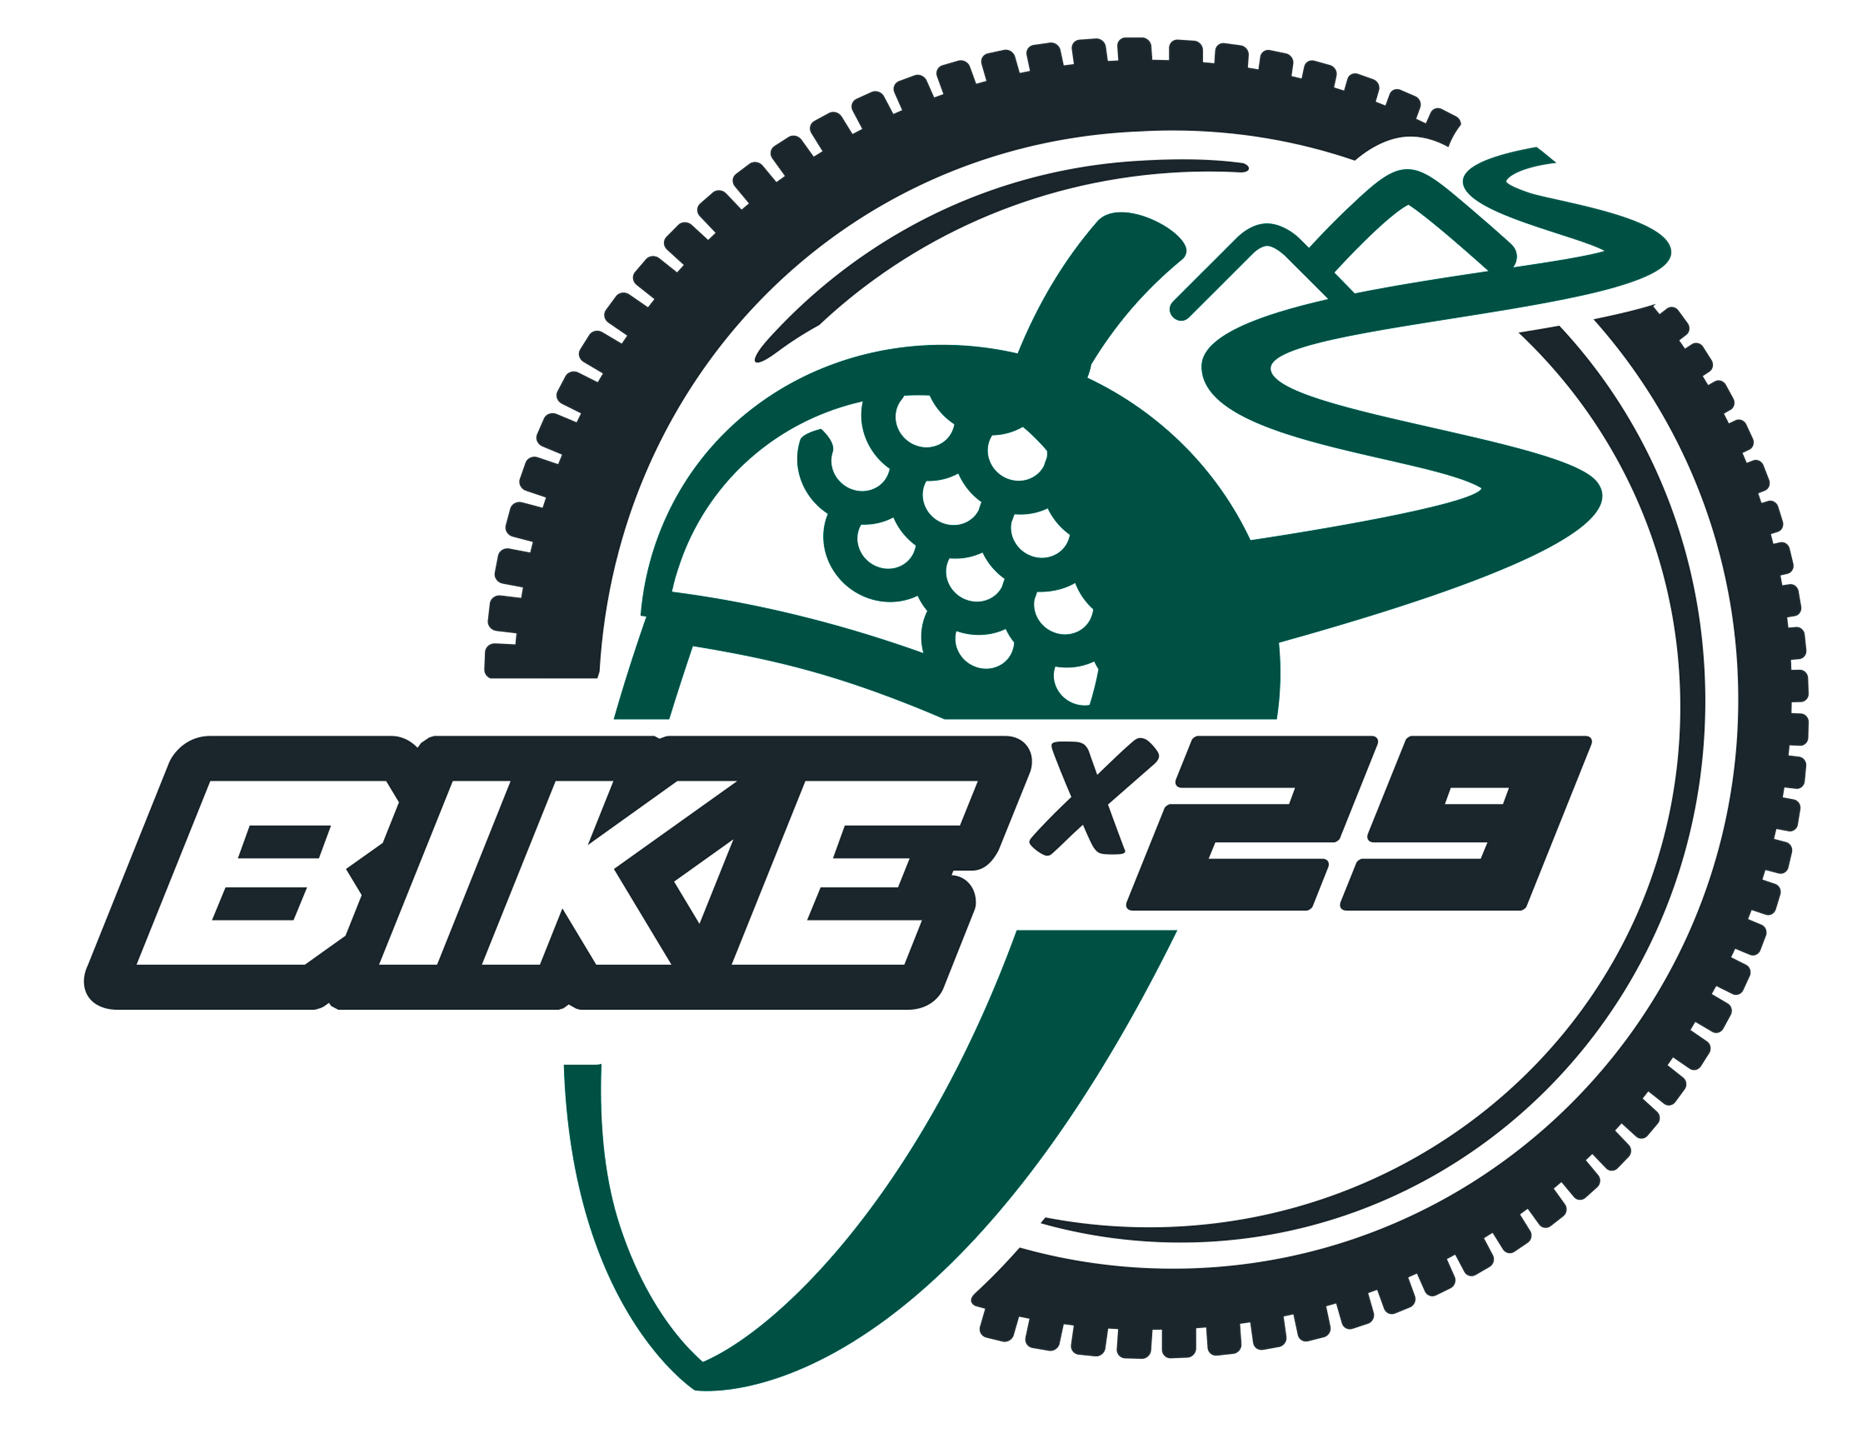 Bike x 29